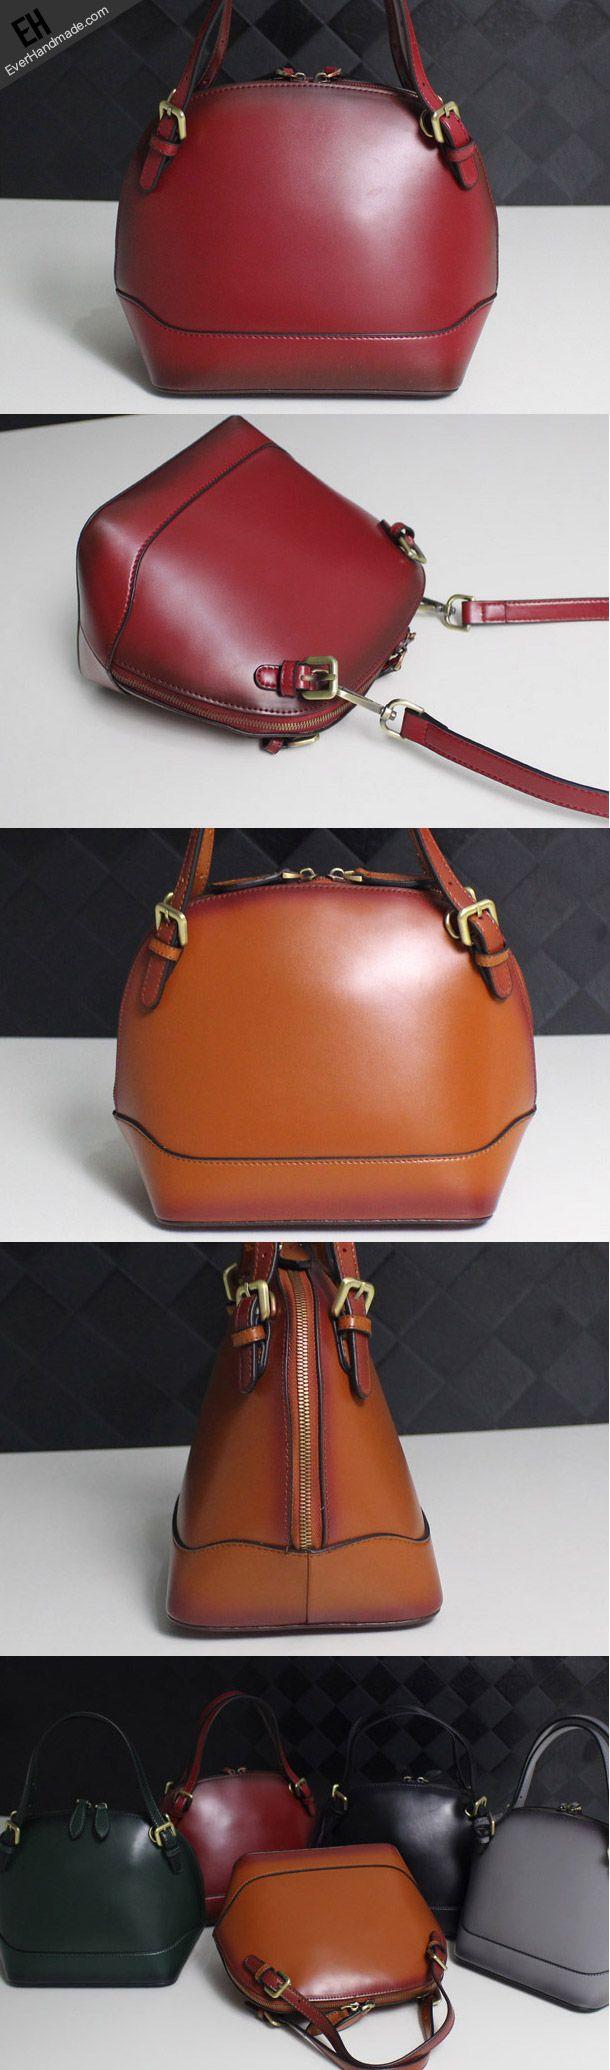 Leather handbag shoulder bag yellow brown black red gray for women leather crossbody bag